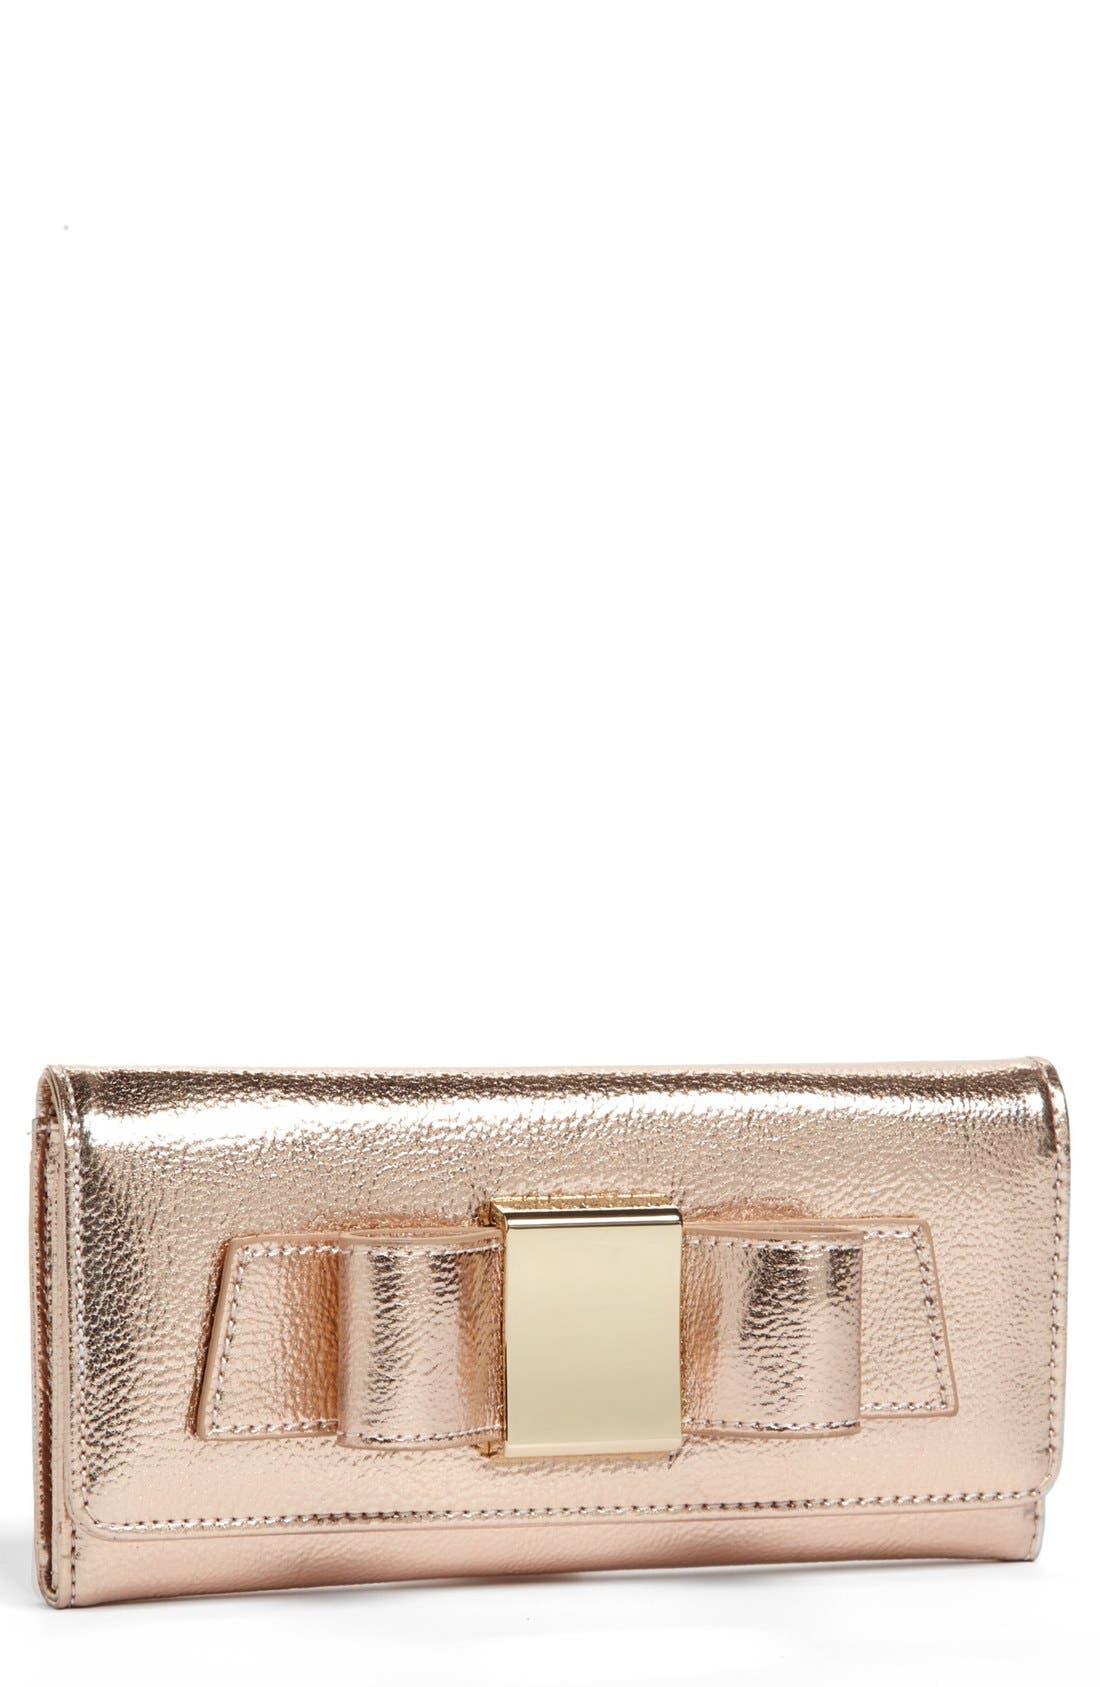 Alternate Image 1 Selected - Ivanka Trump 'Blair' Metallic Wallet